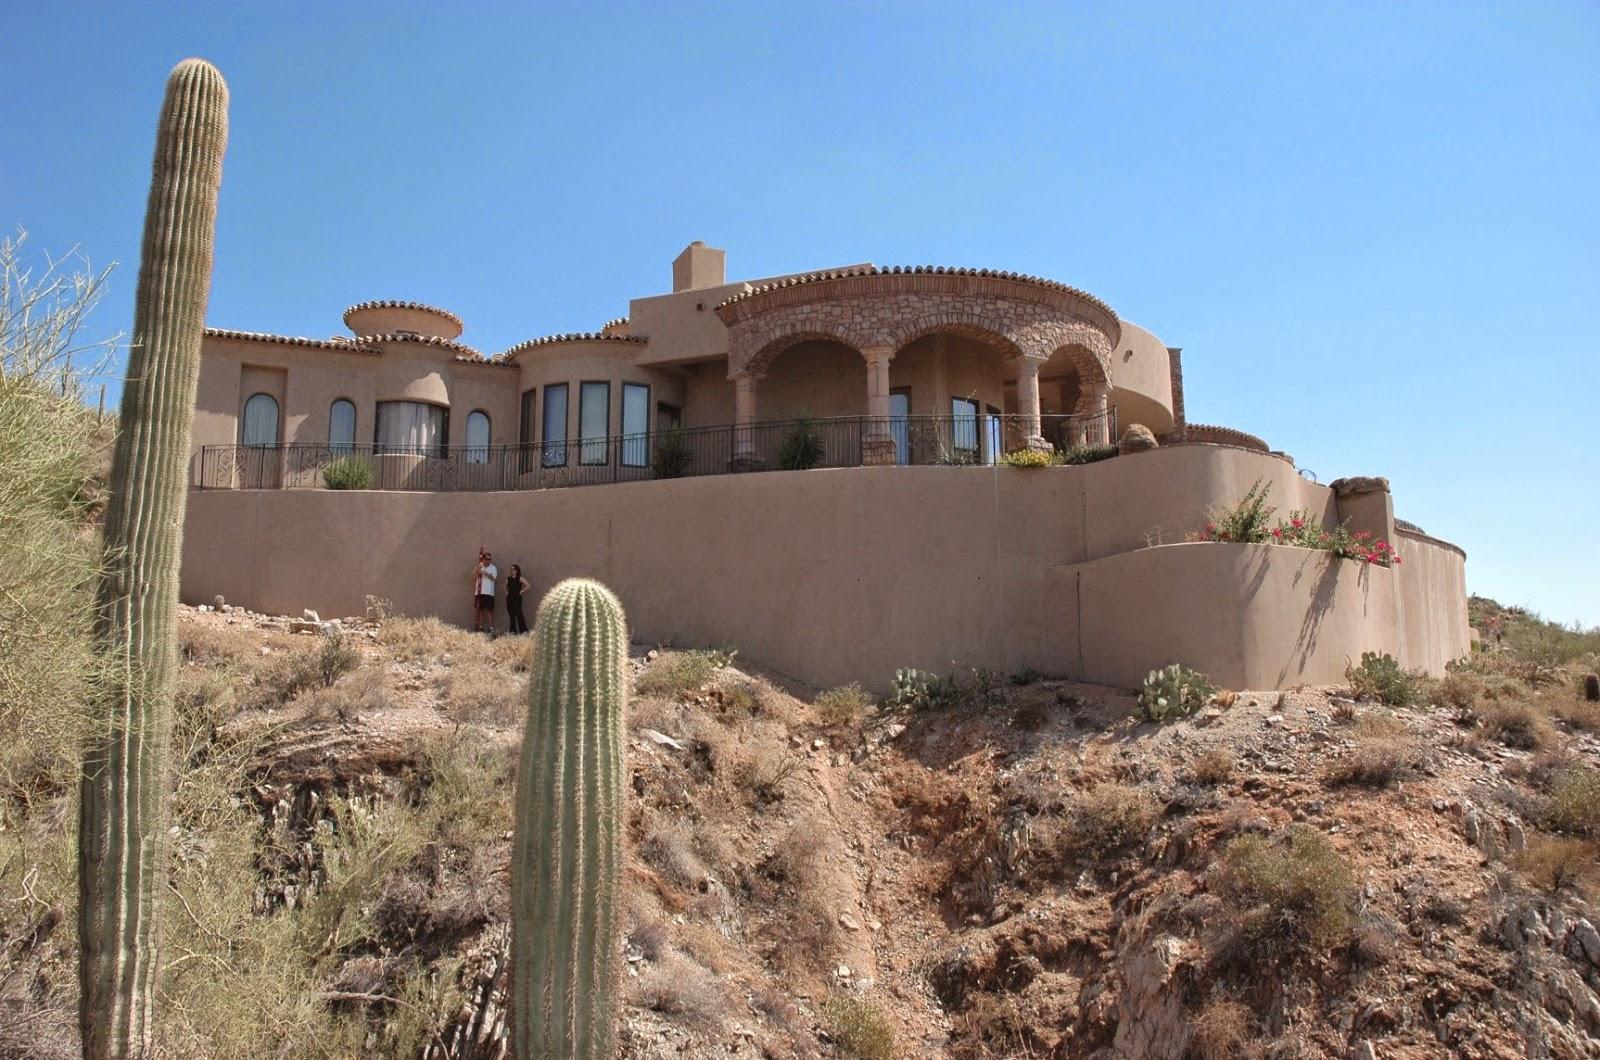 Arizona Home on the Edge: Part 1 – Construction Errors